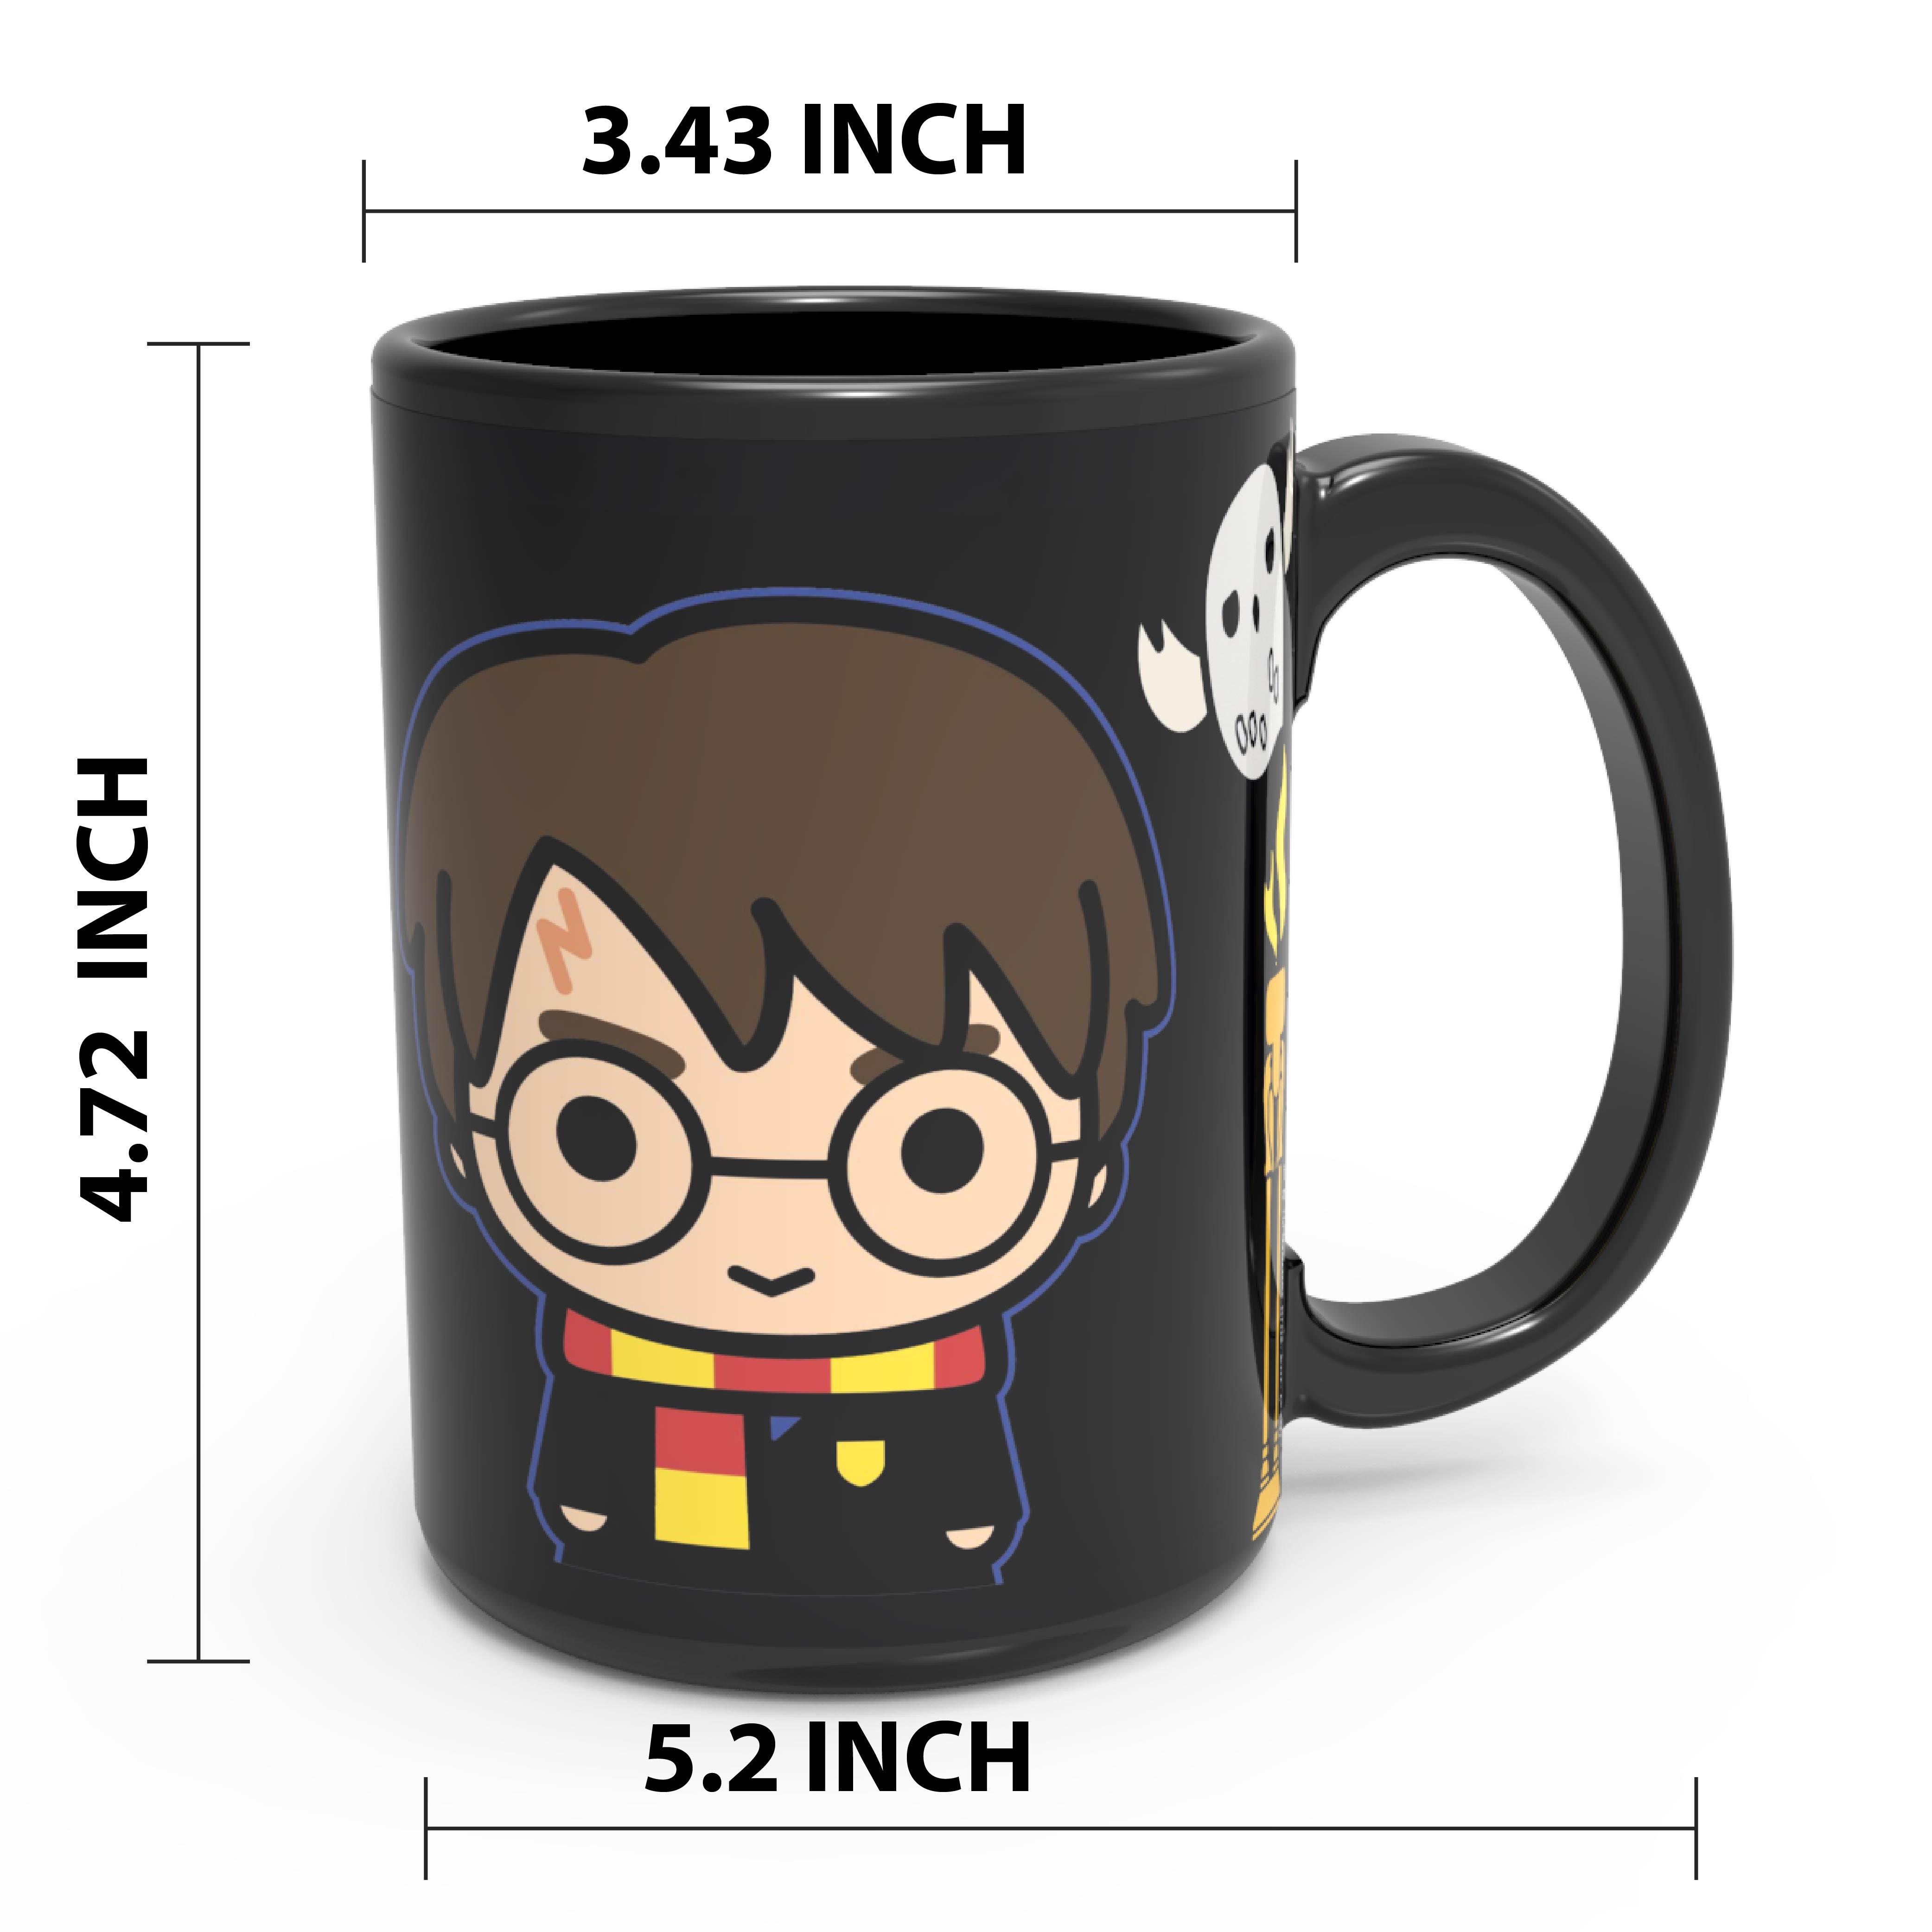 Harry Potter 15 oz. Coffee Mug, The Sorcerer's Stone slideshow image 11